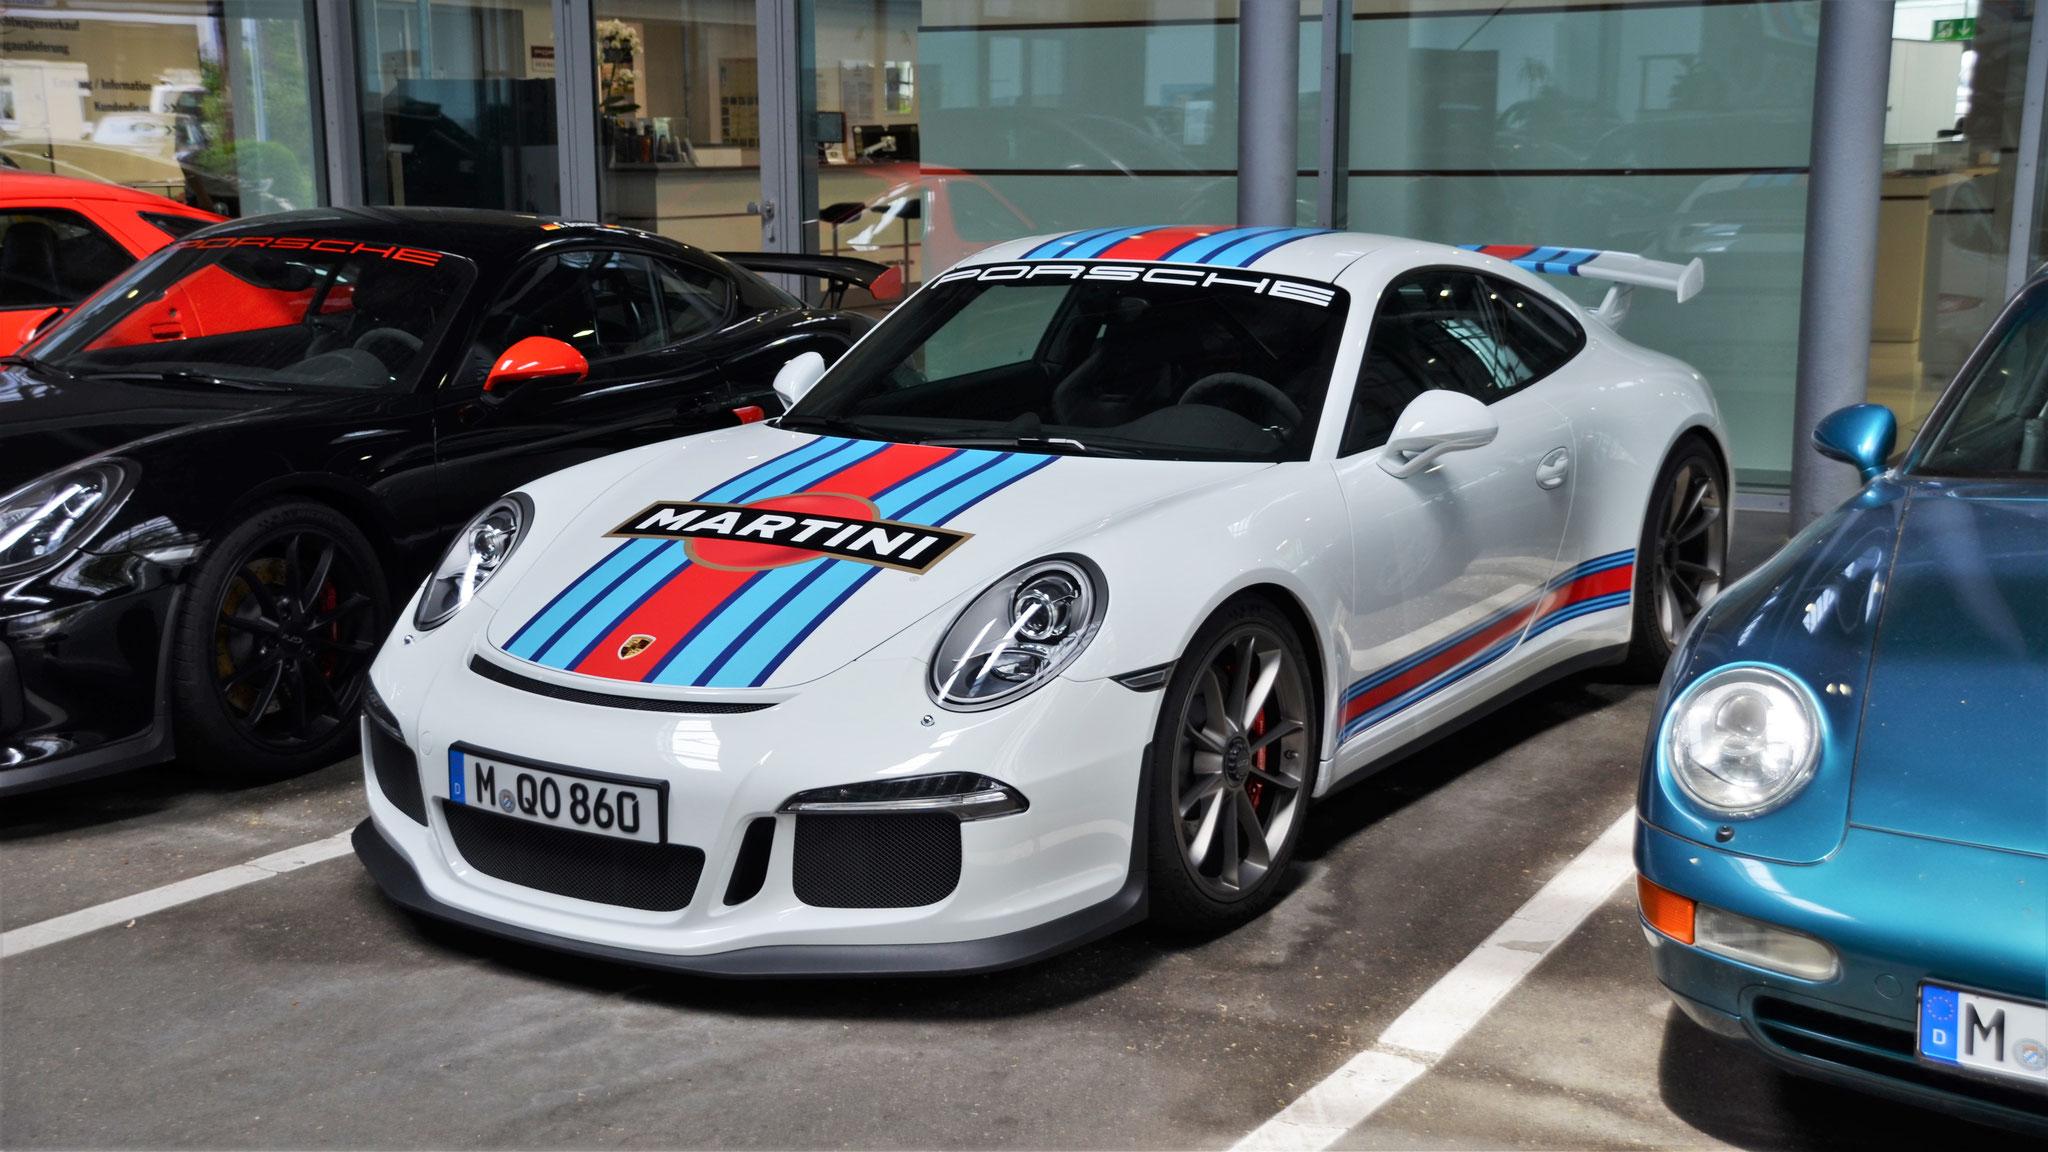 Porsche 991 GT3 - M-QO-860